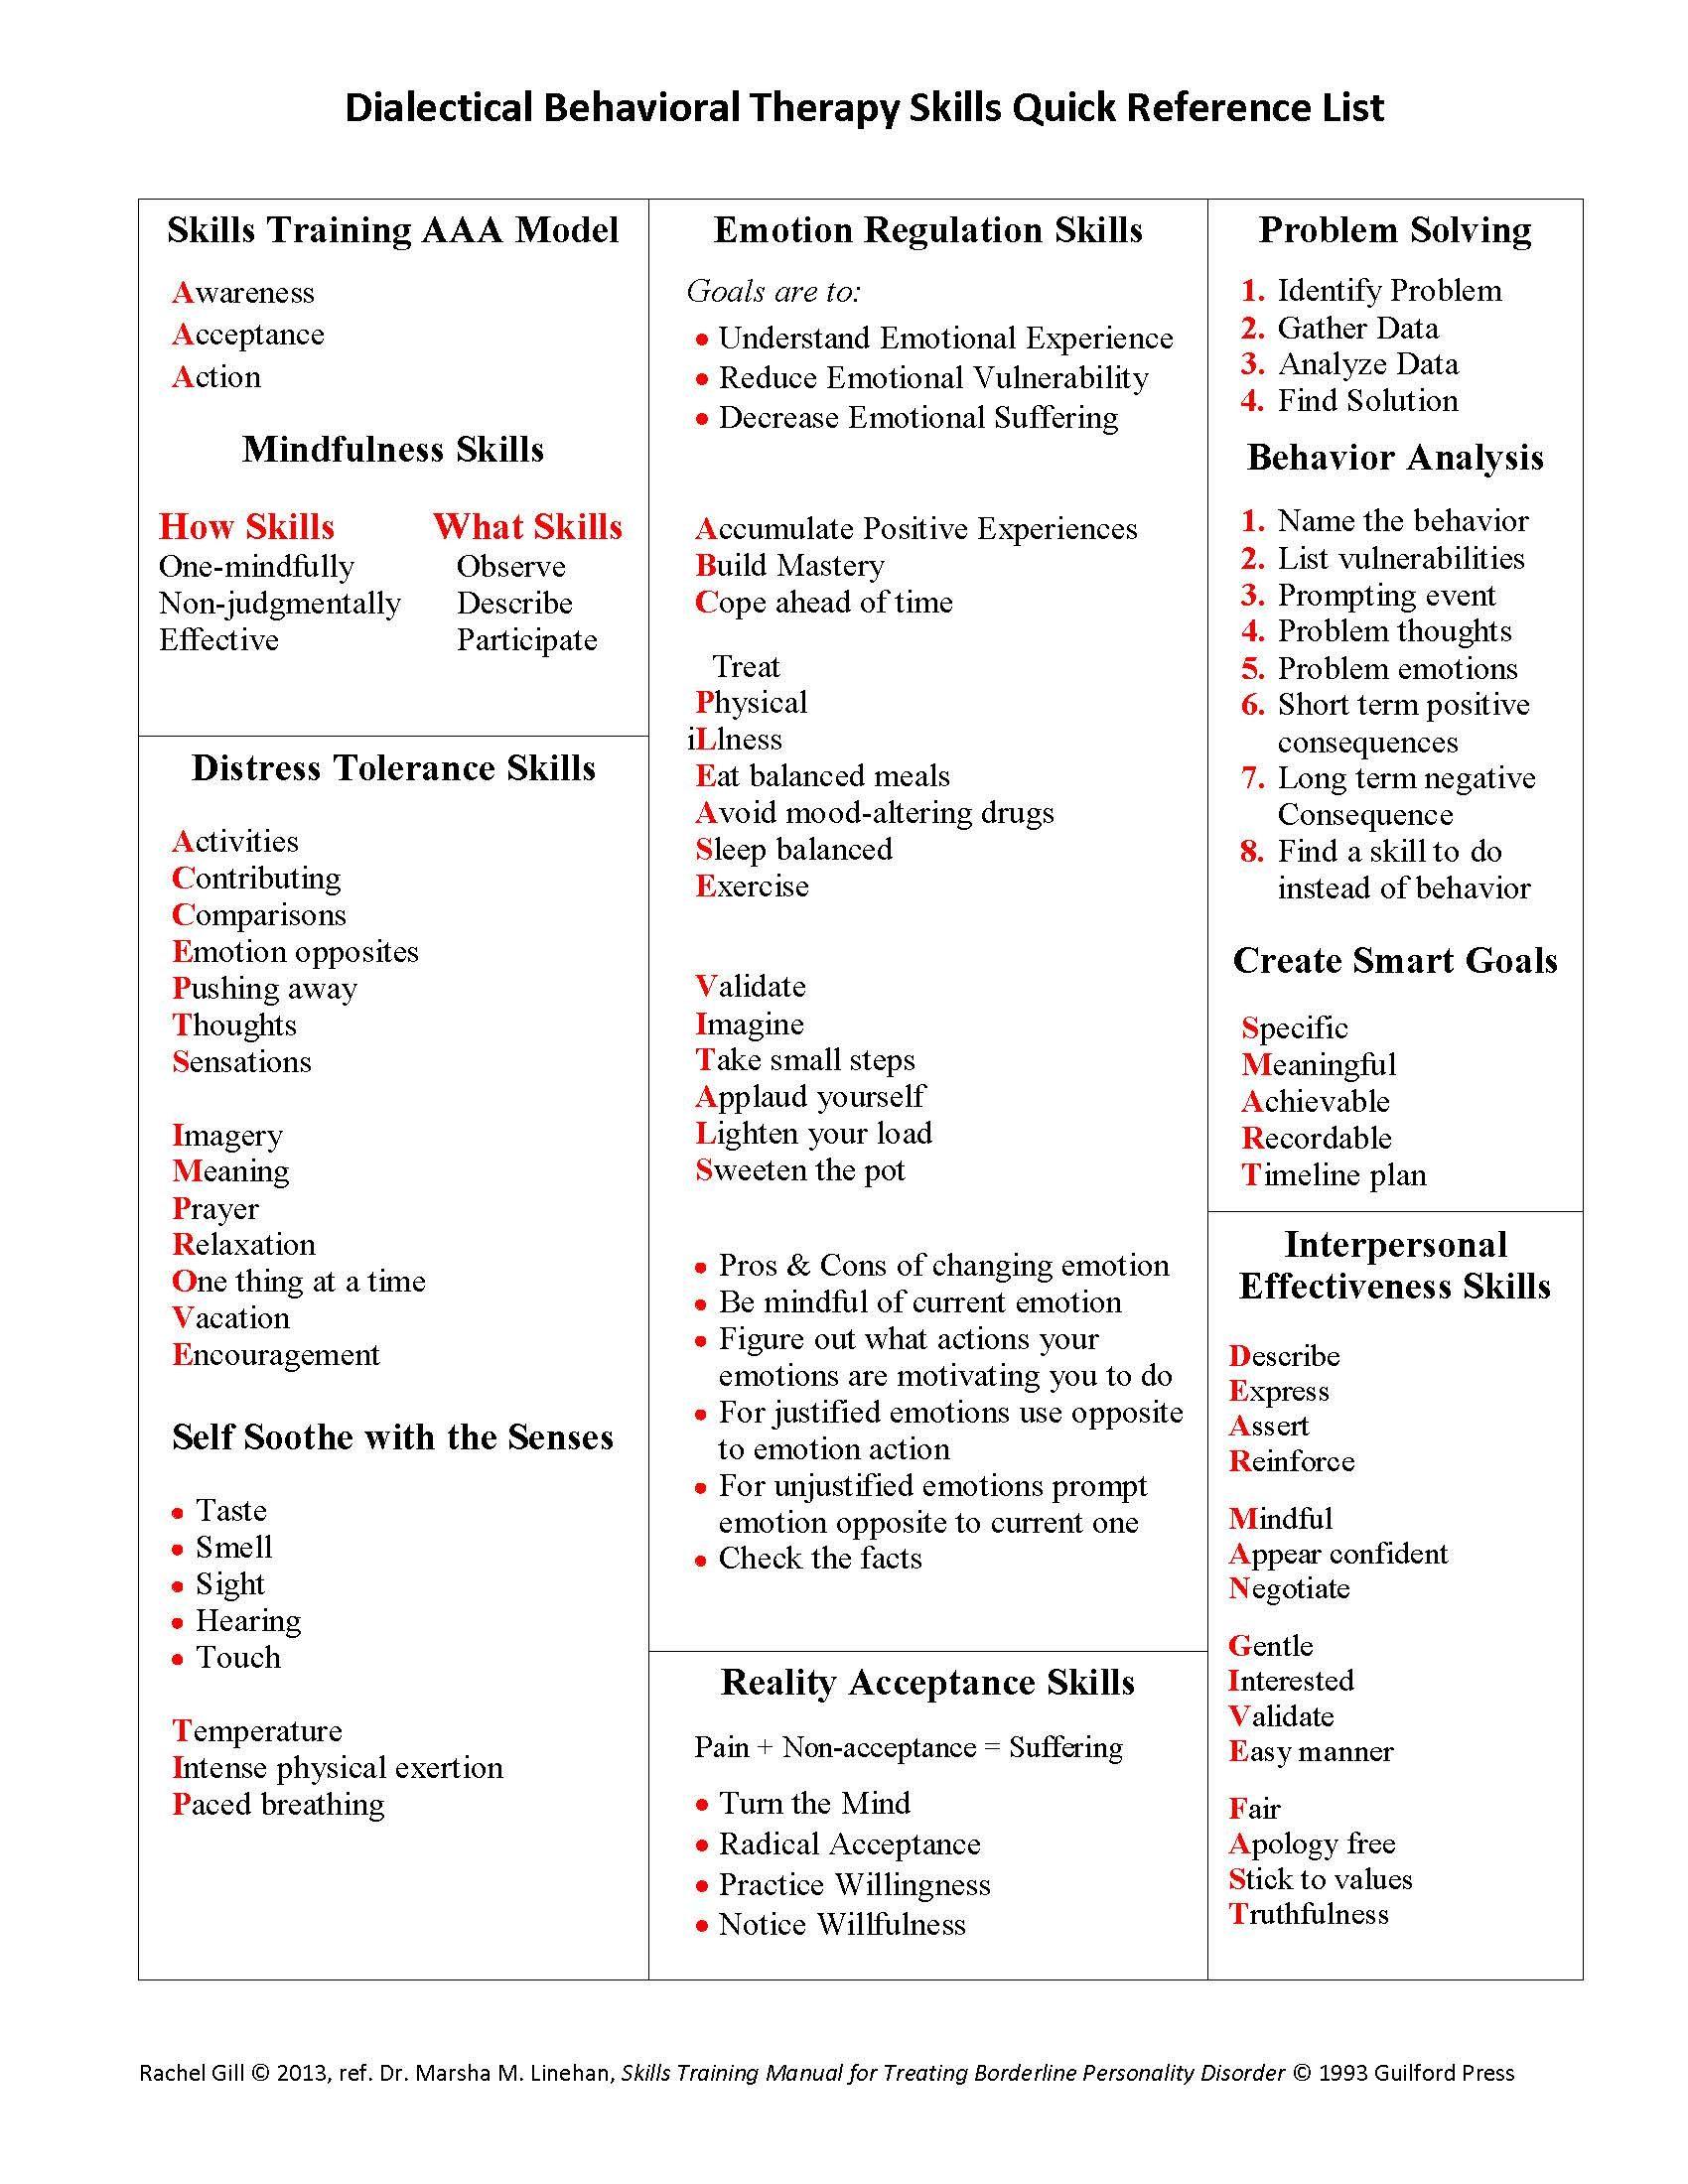 Dbt Skills Quick Reference List